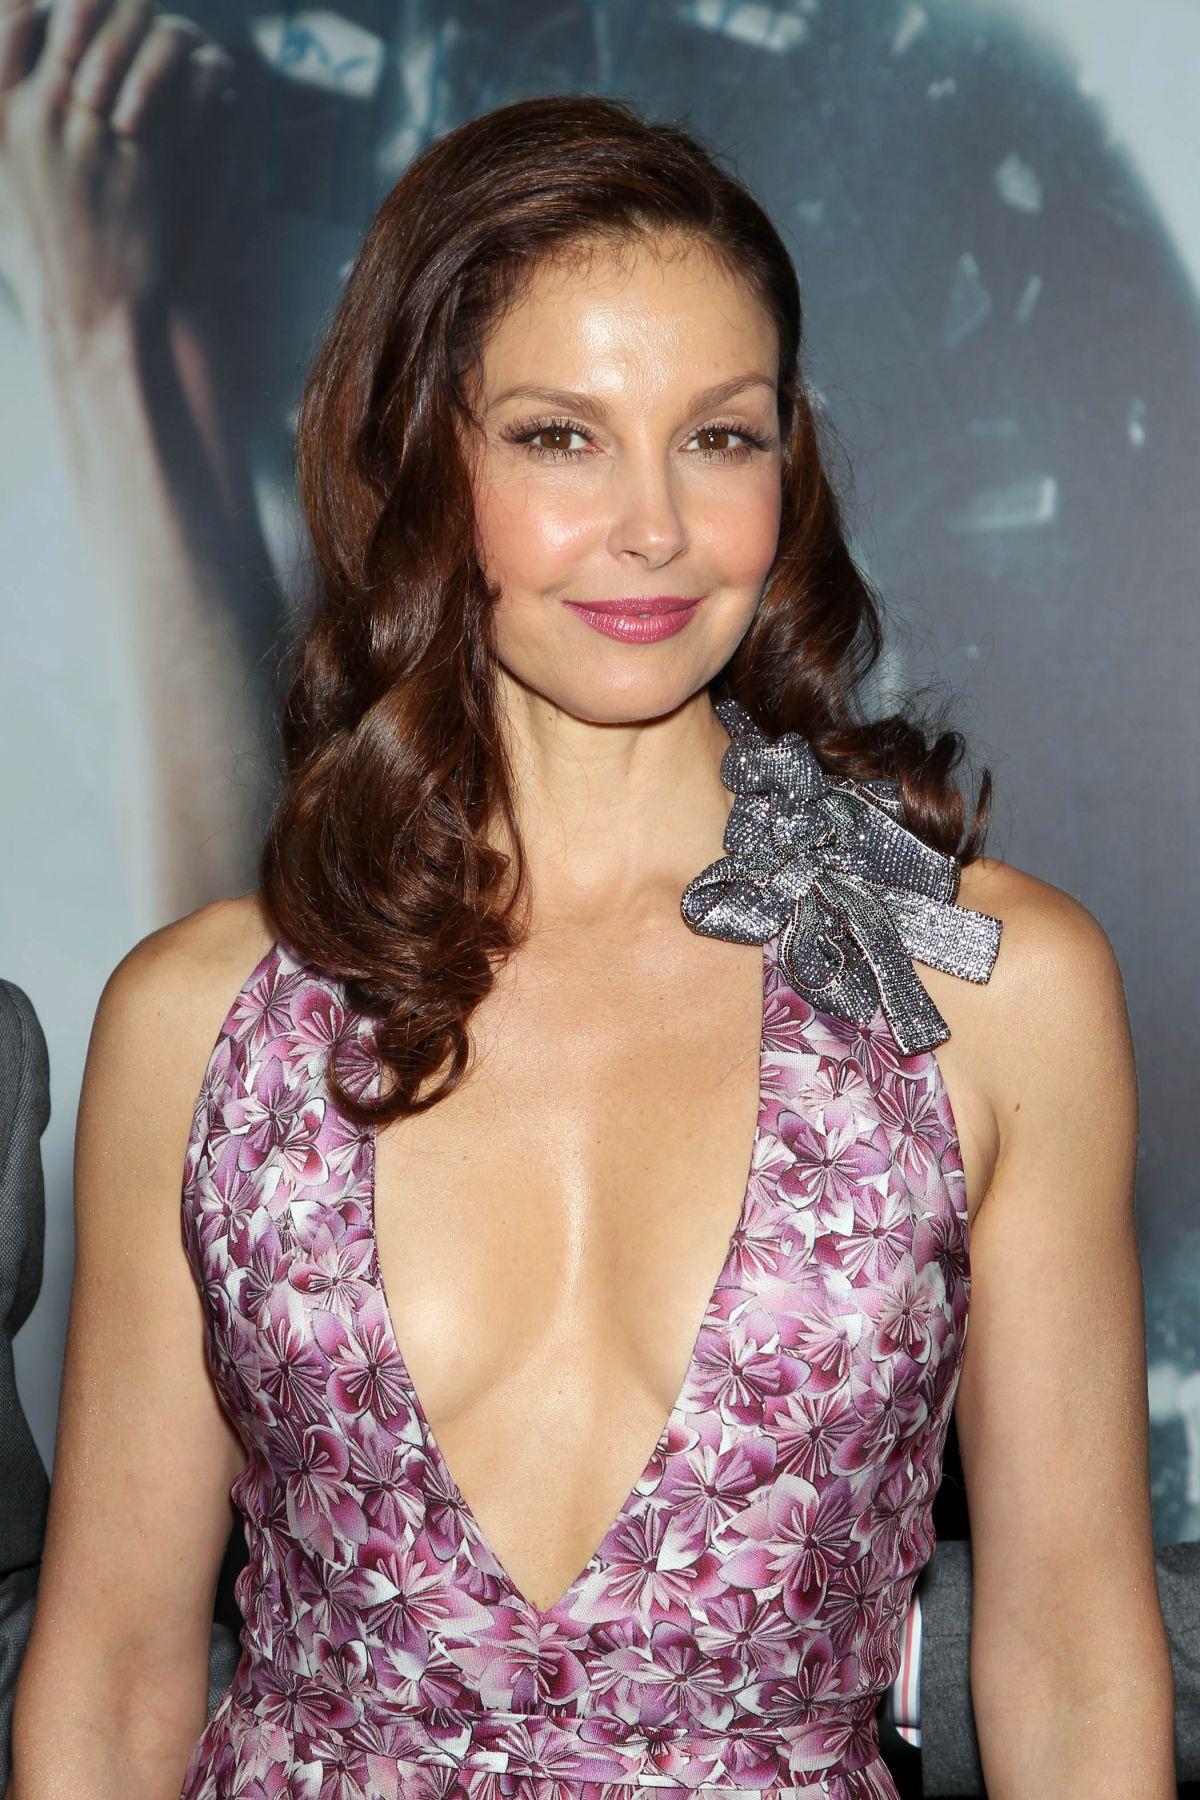 Ashley Judd Nue Photos - frbiguznet